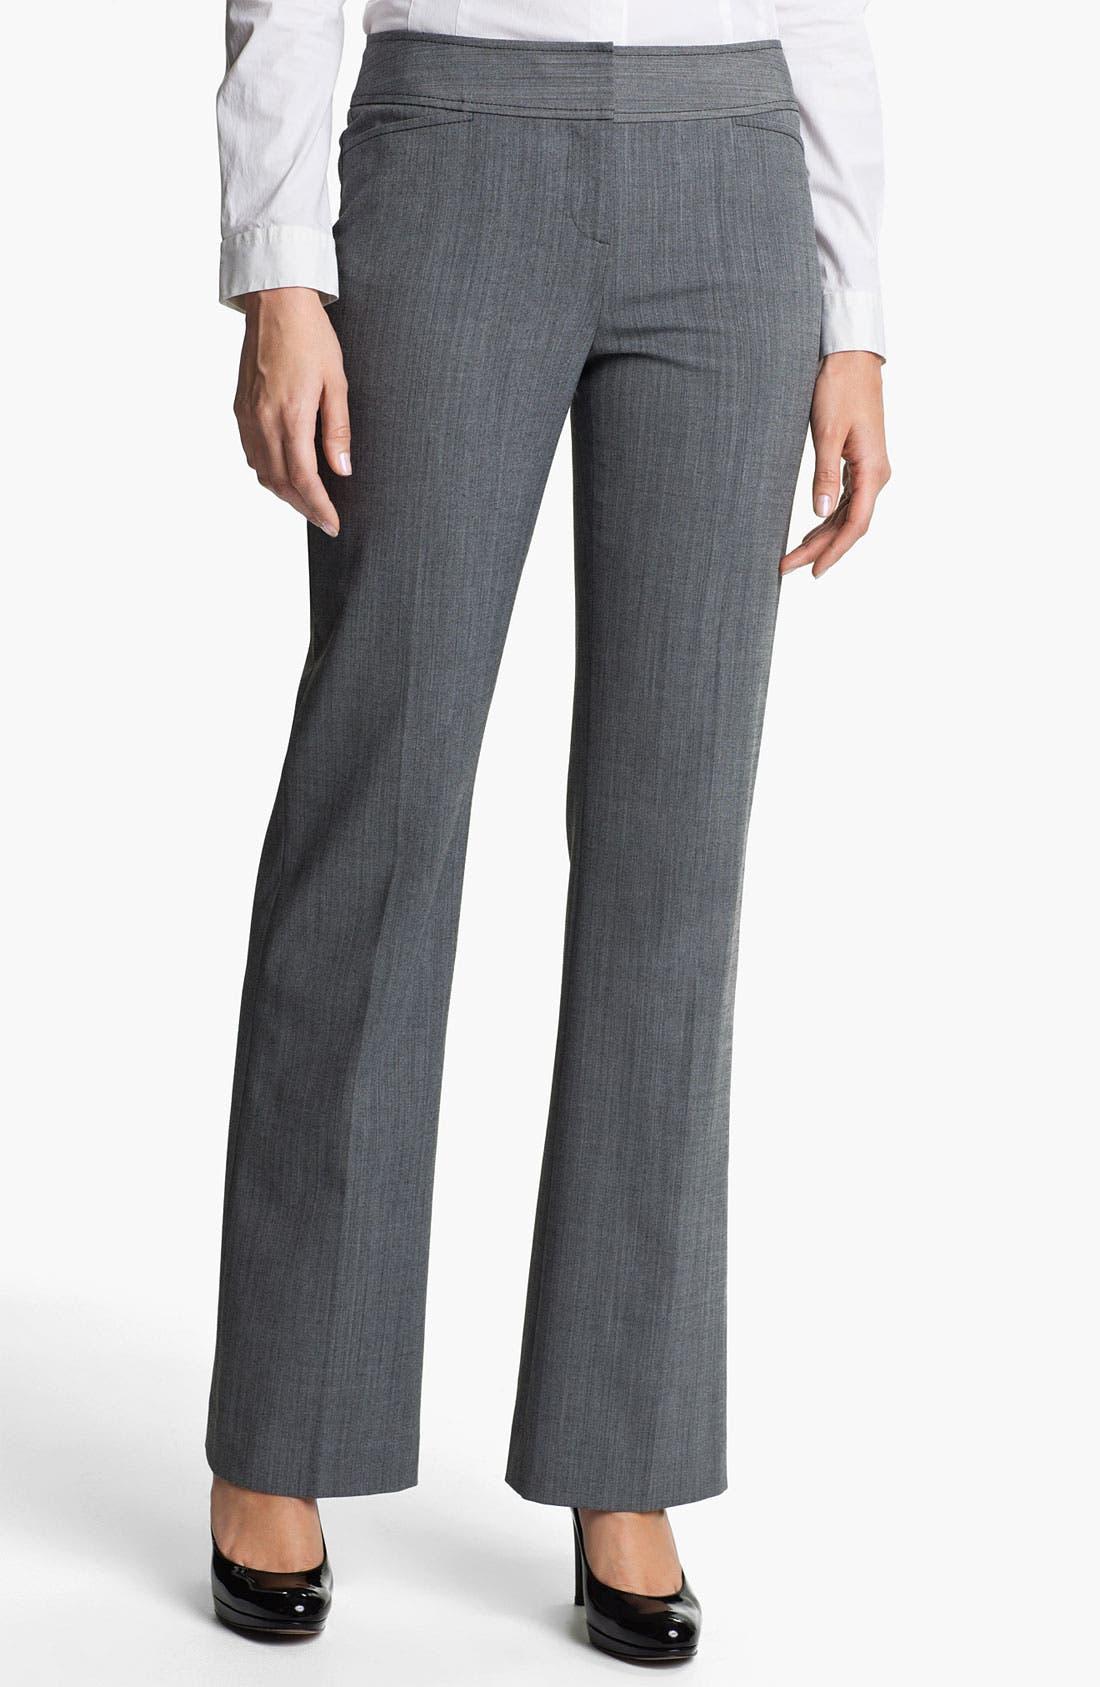 Main Image - Halogen® 'Taylor' Cross Dye Curvy Fit Pants